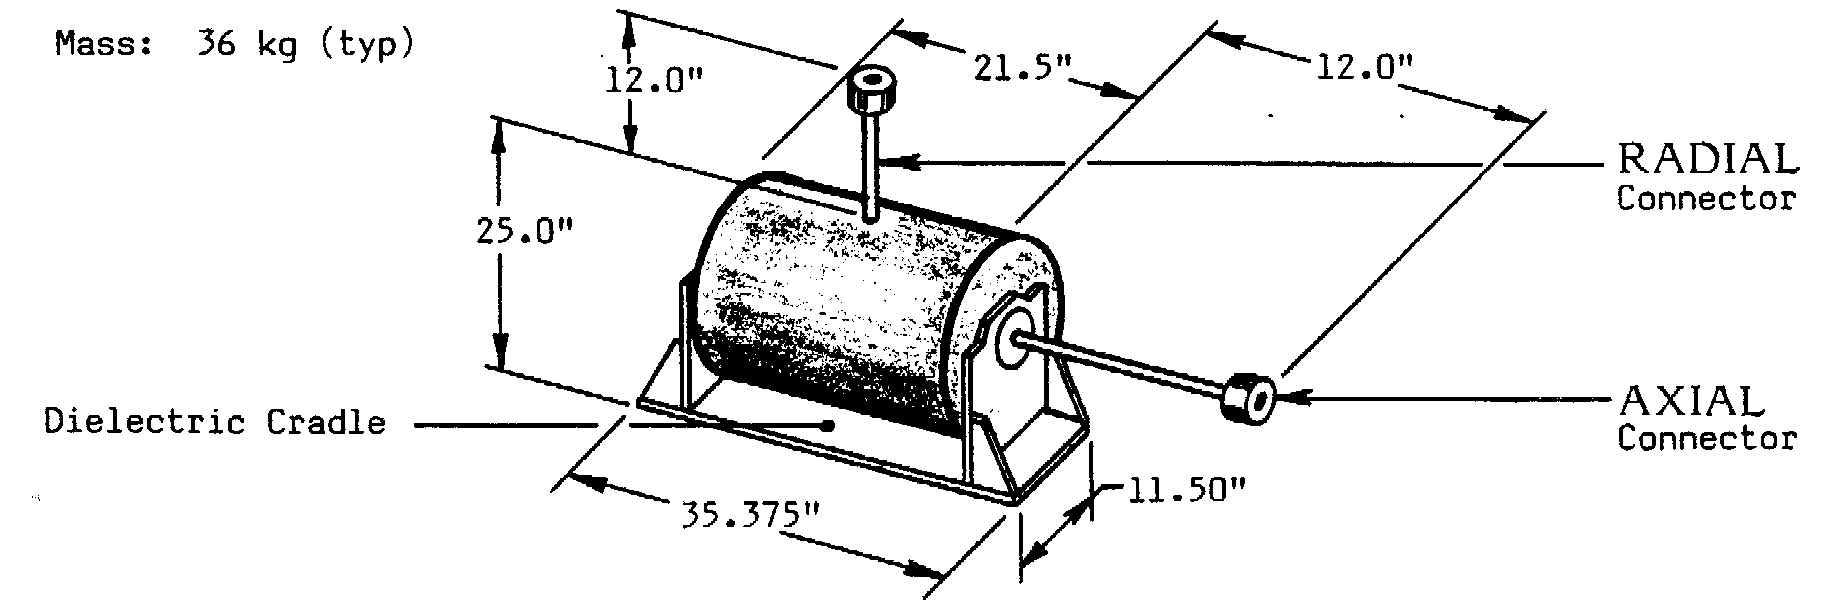 Prodyn B10 magnetic field sensor product outline